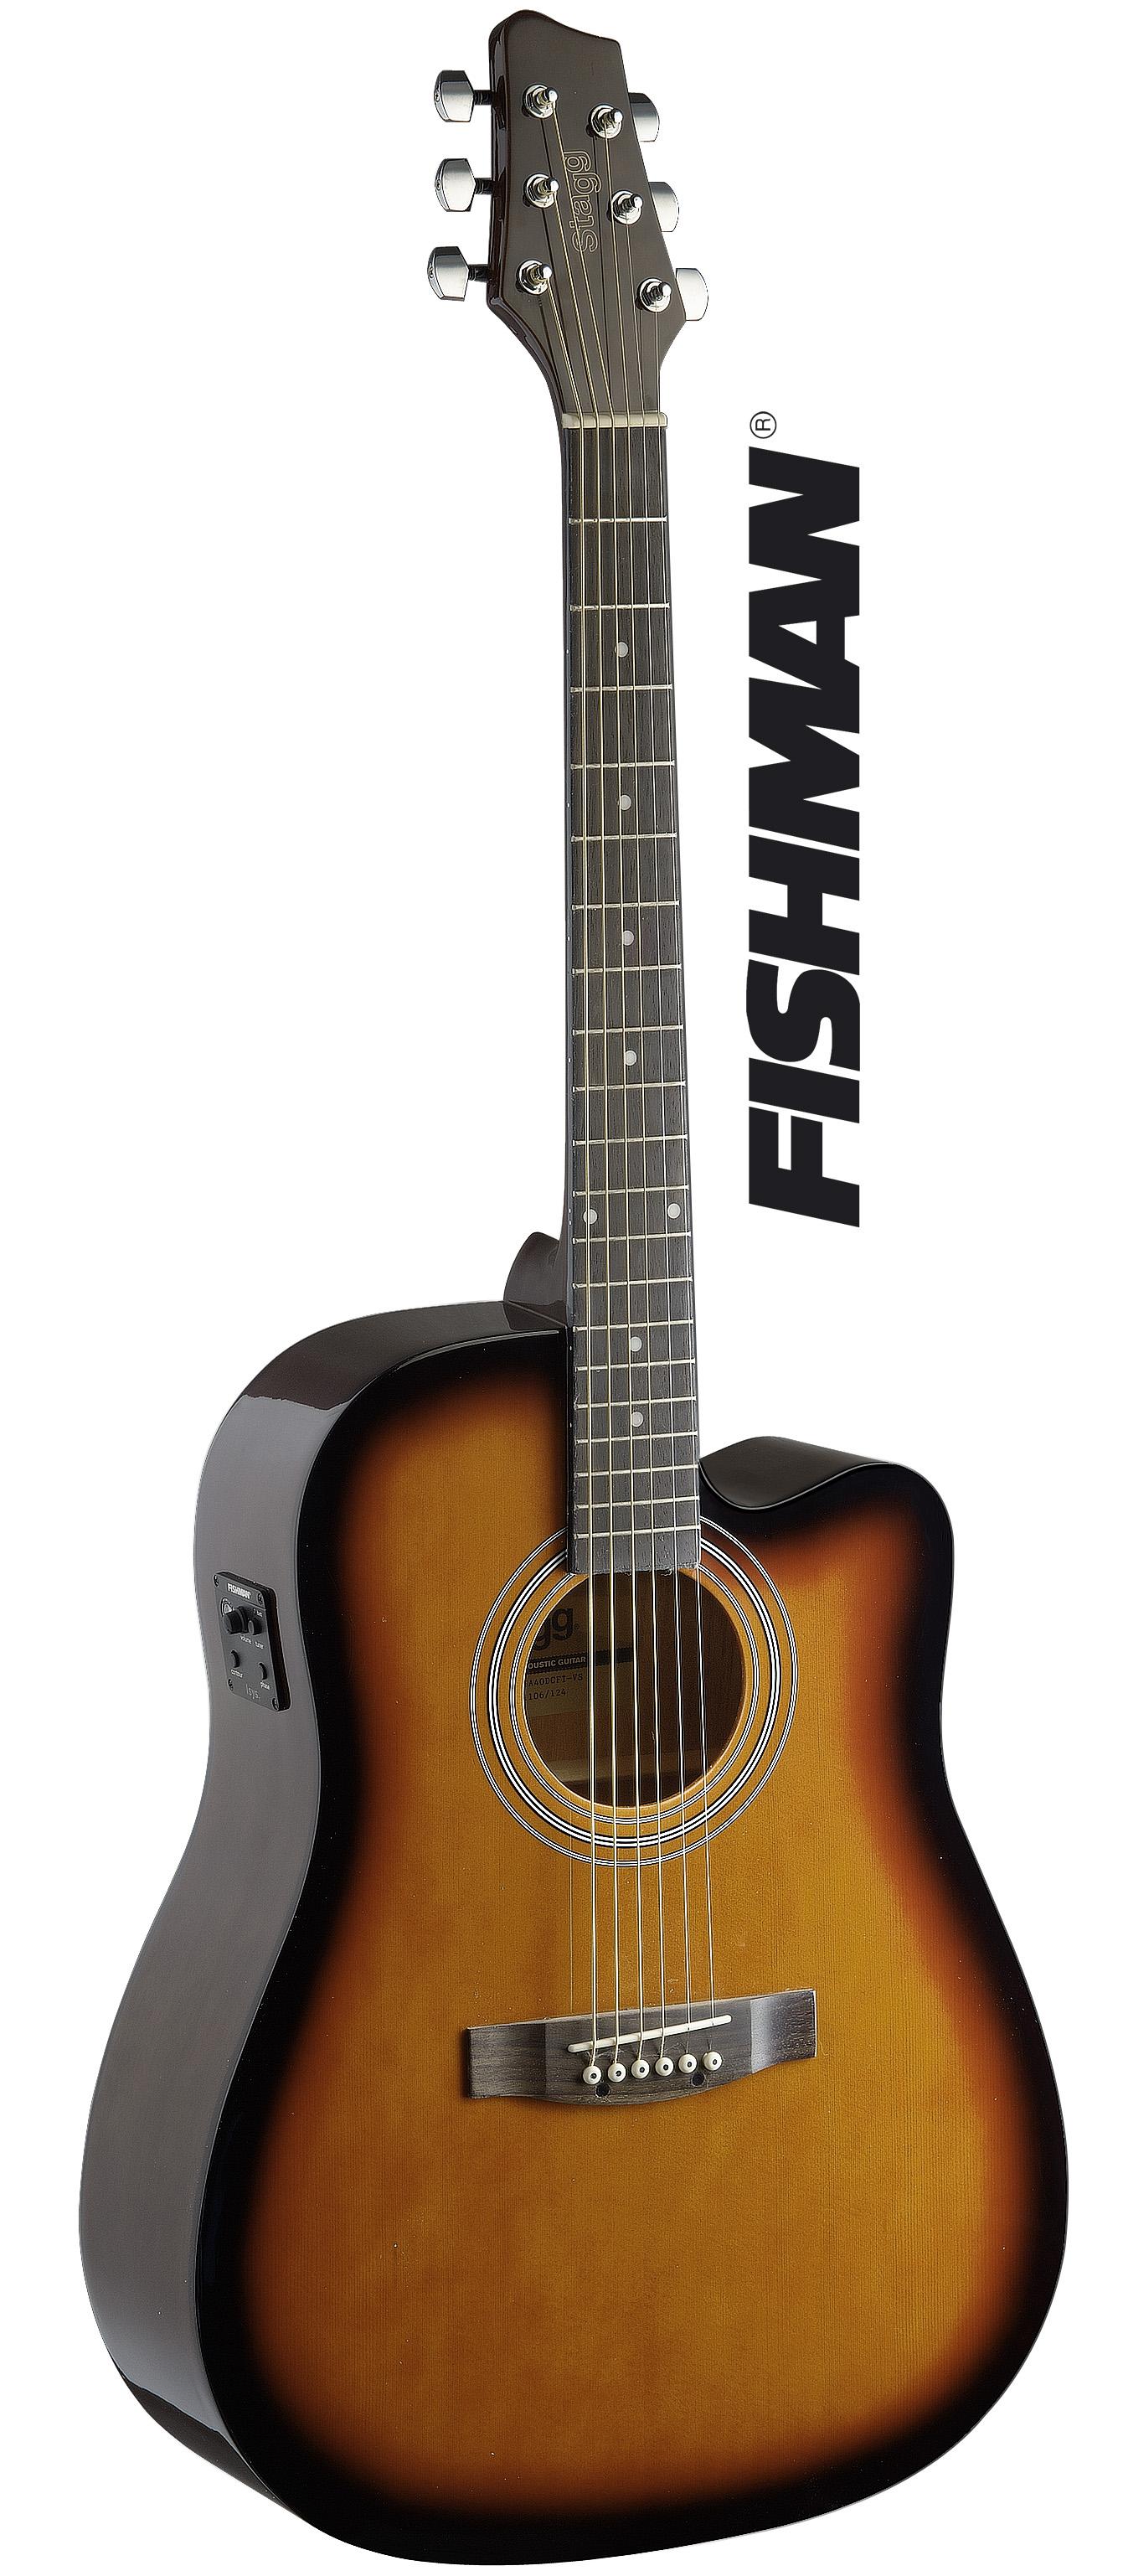 Stagg SA40DCFI-BS, elektro-akustická kytara, sunburst hnědý